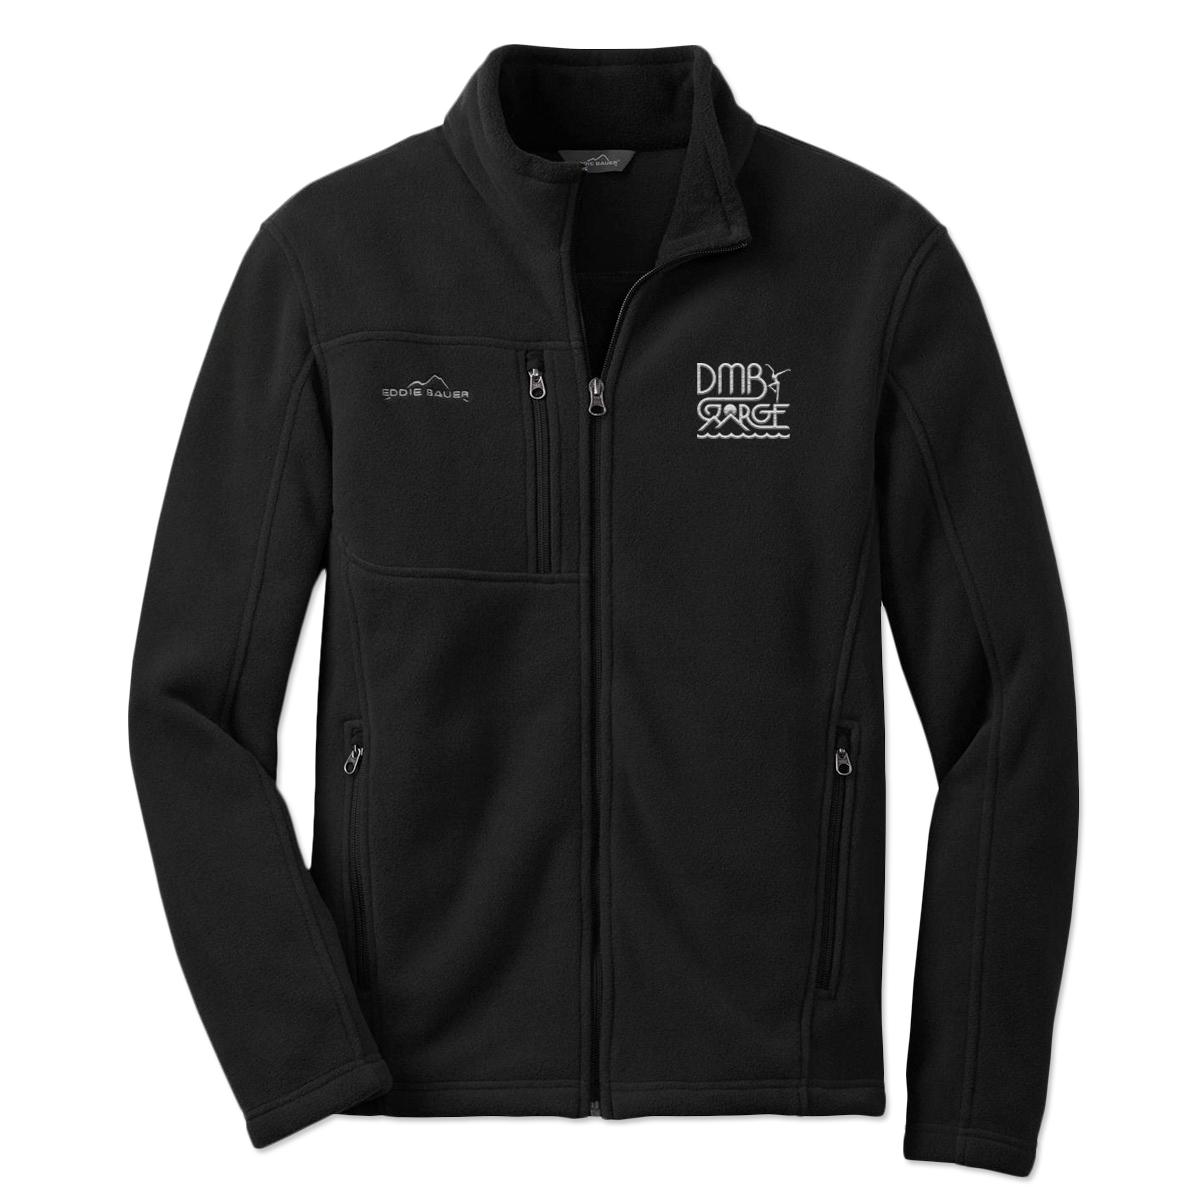 DMB The Gorge 2015 Fleece Jacket by Eddie Bauer